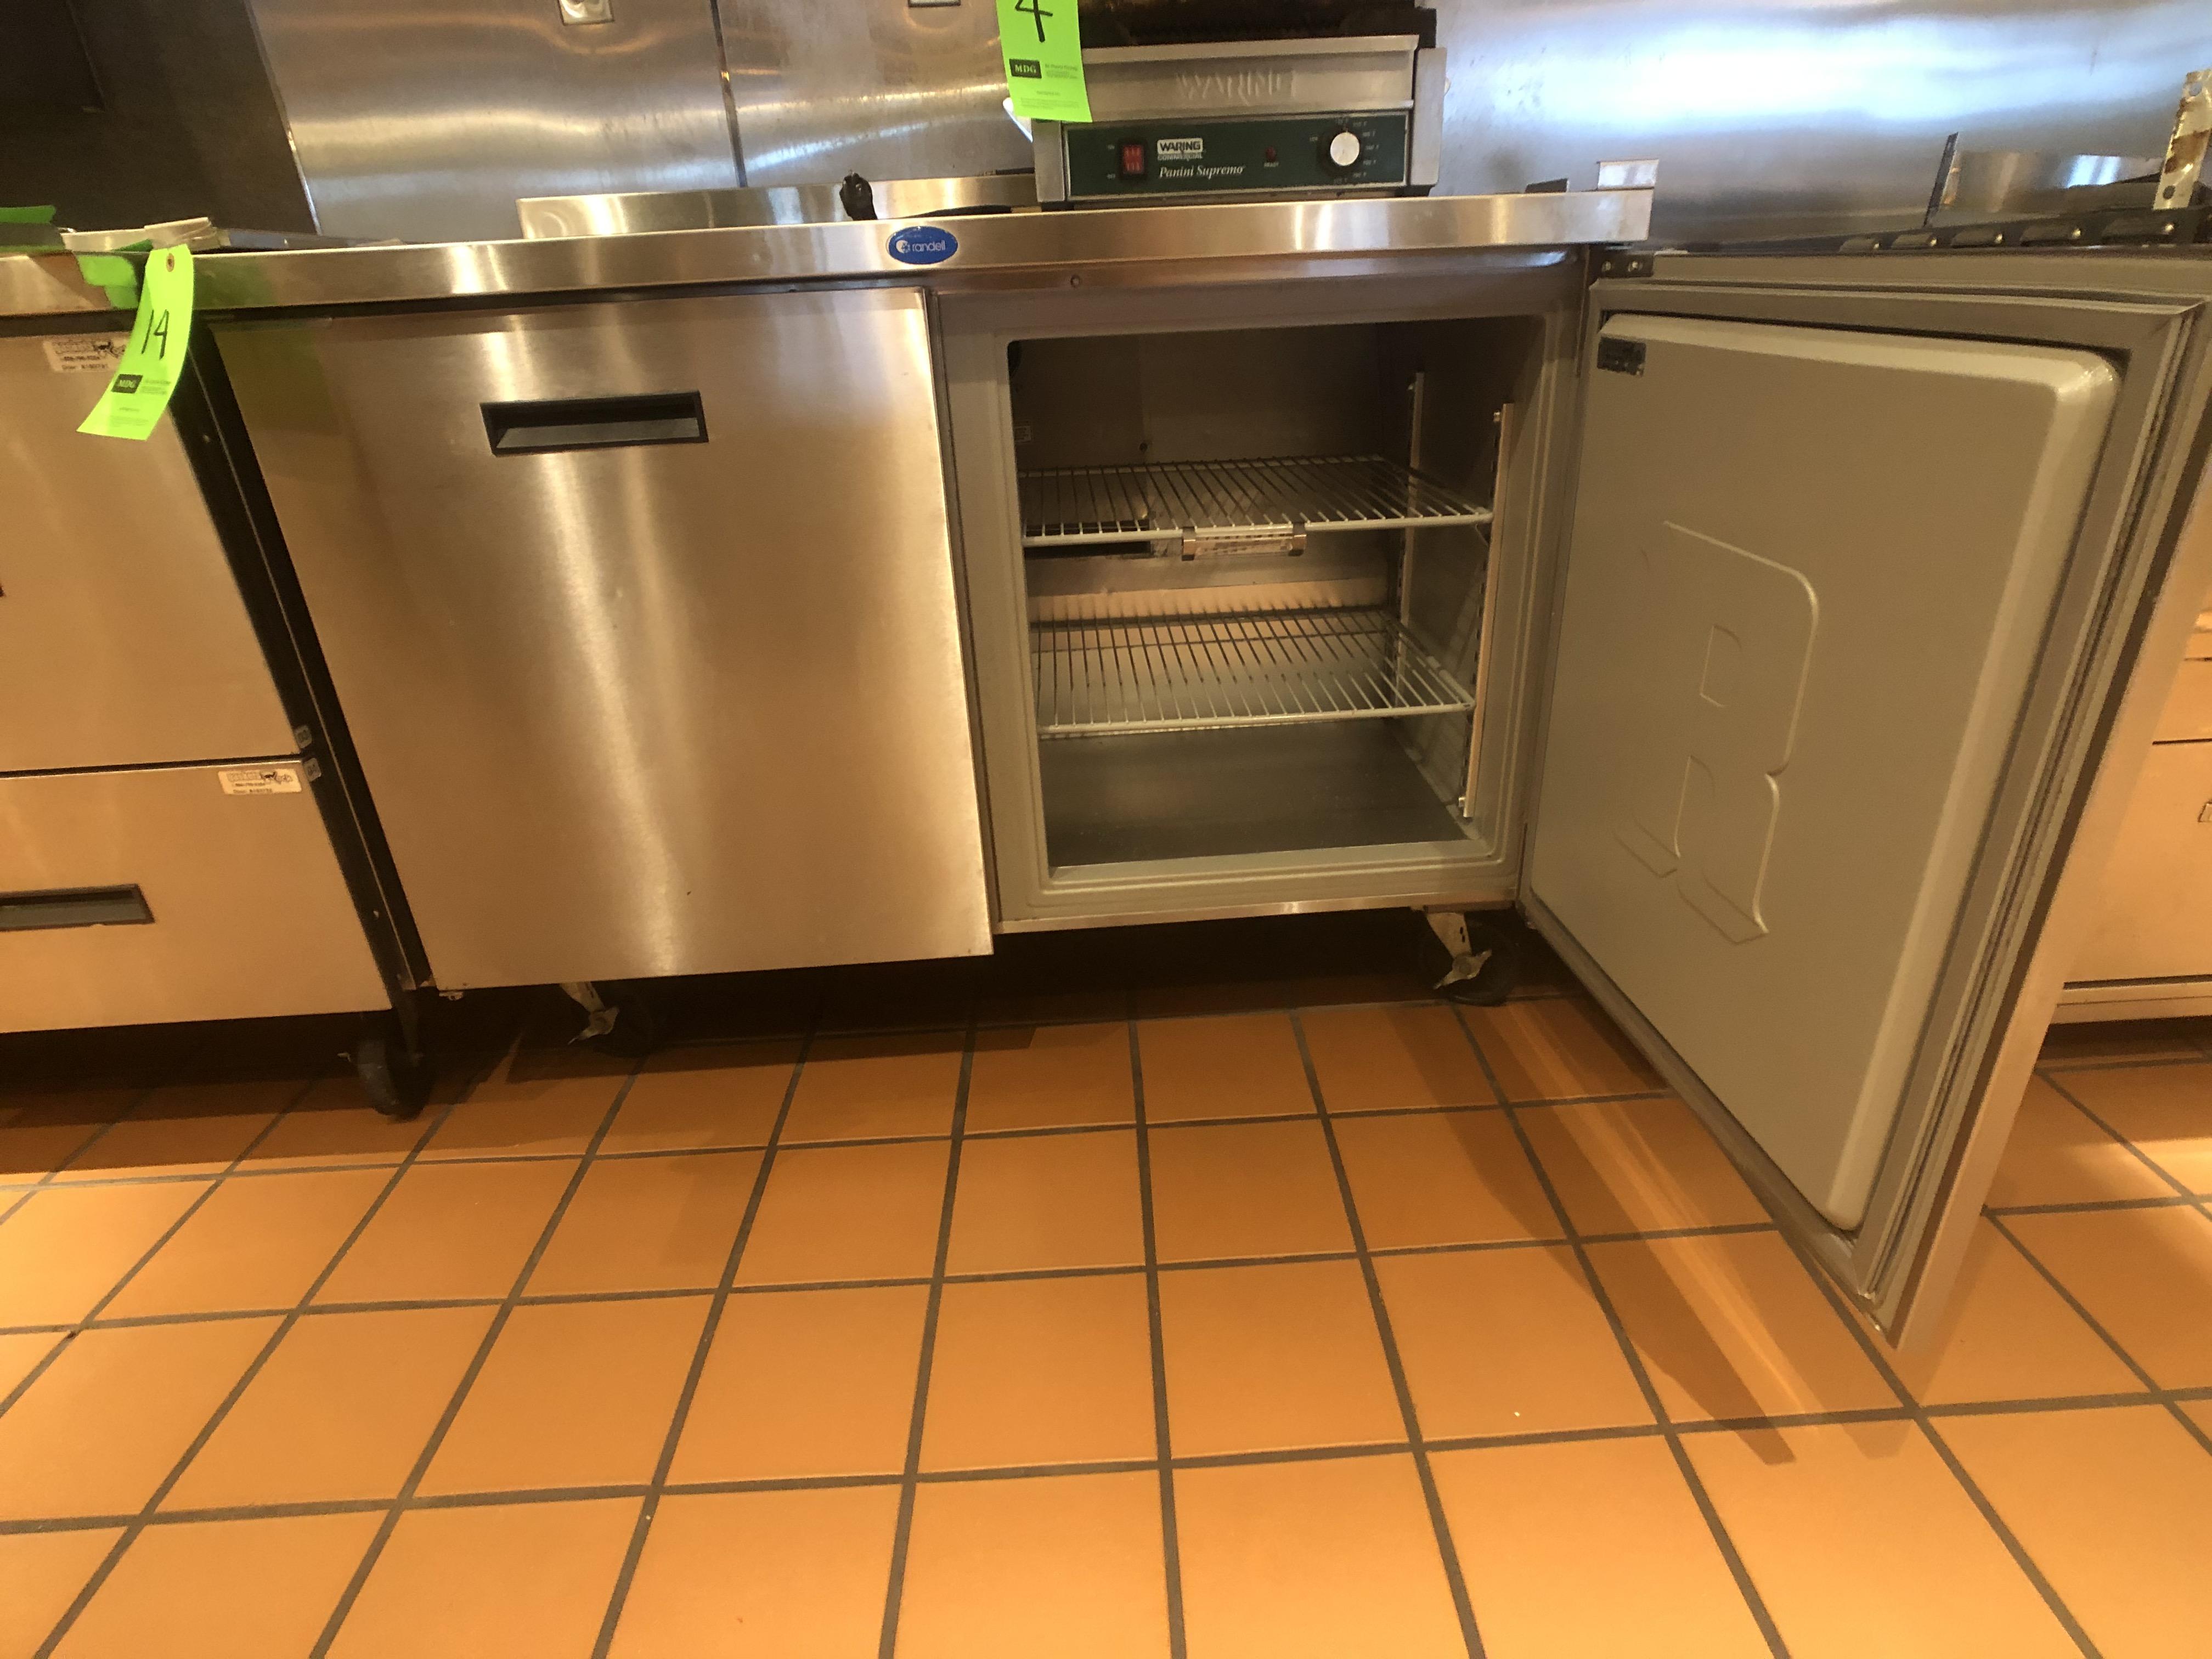 "Randell (2) Door Worktop Refrigerator, Model 9302-7, 48"" W x 30"" D x 36"" H, Mounted on Casters - Image 3 of 4"